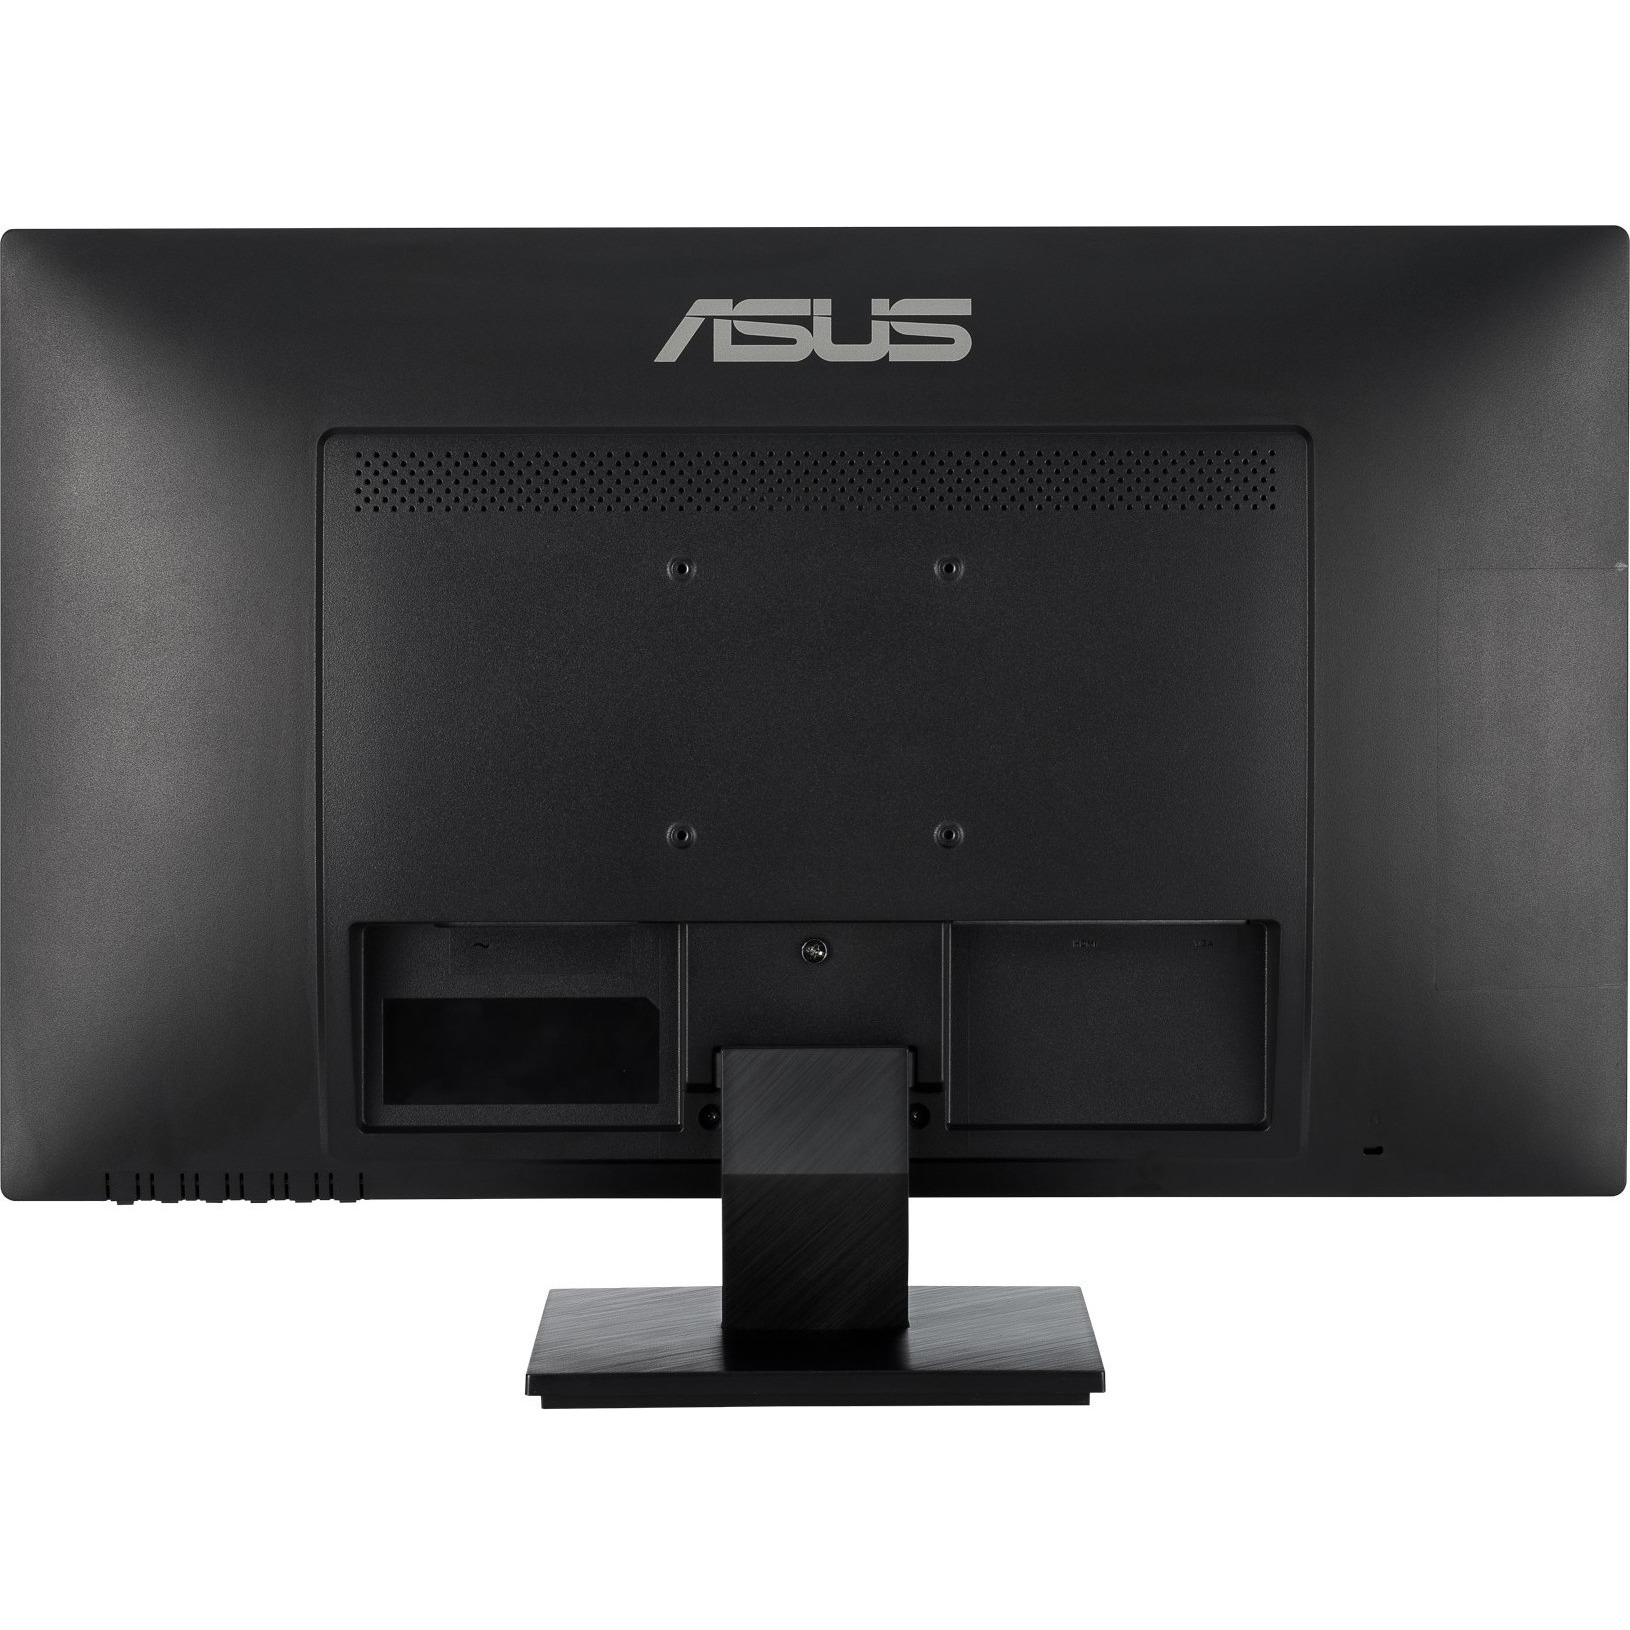 Asus VA279HAE 27inch WLED LCD Monitor - 16:9 - 6 ms GTG